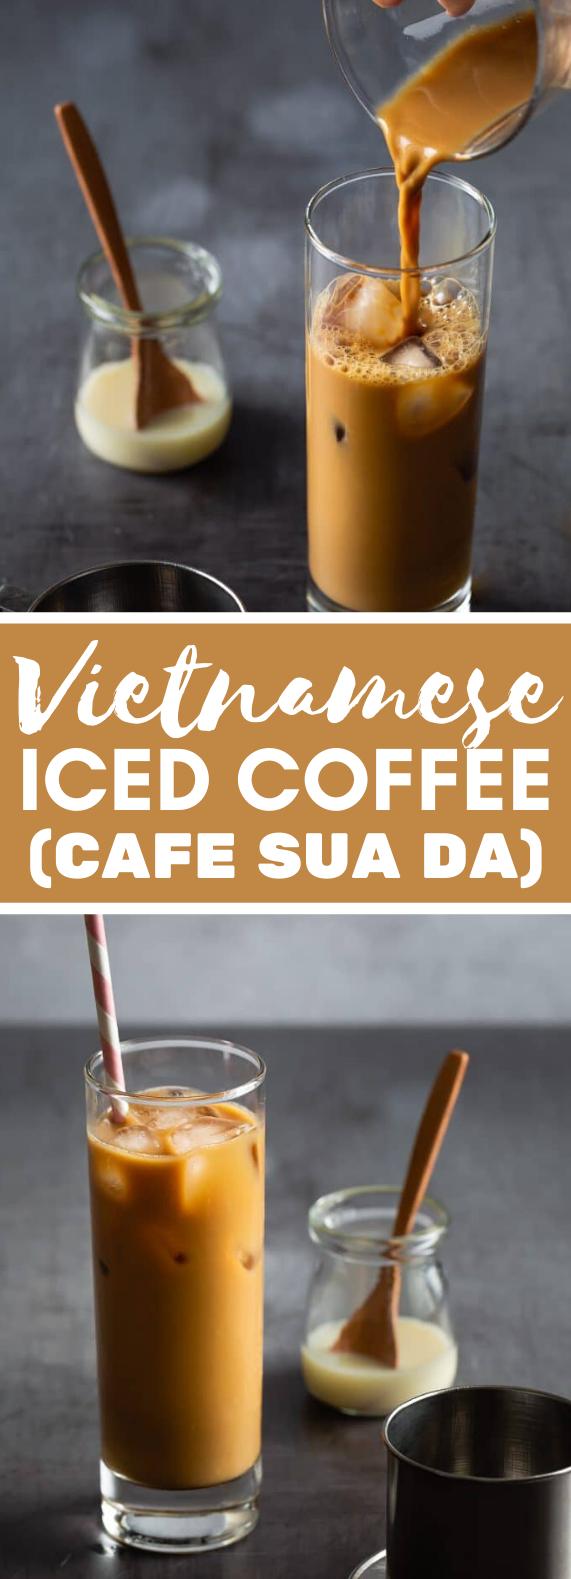 VIETNAMESE ICED COFFEE (CAFE SUA DA) #drinks #milk